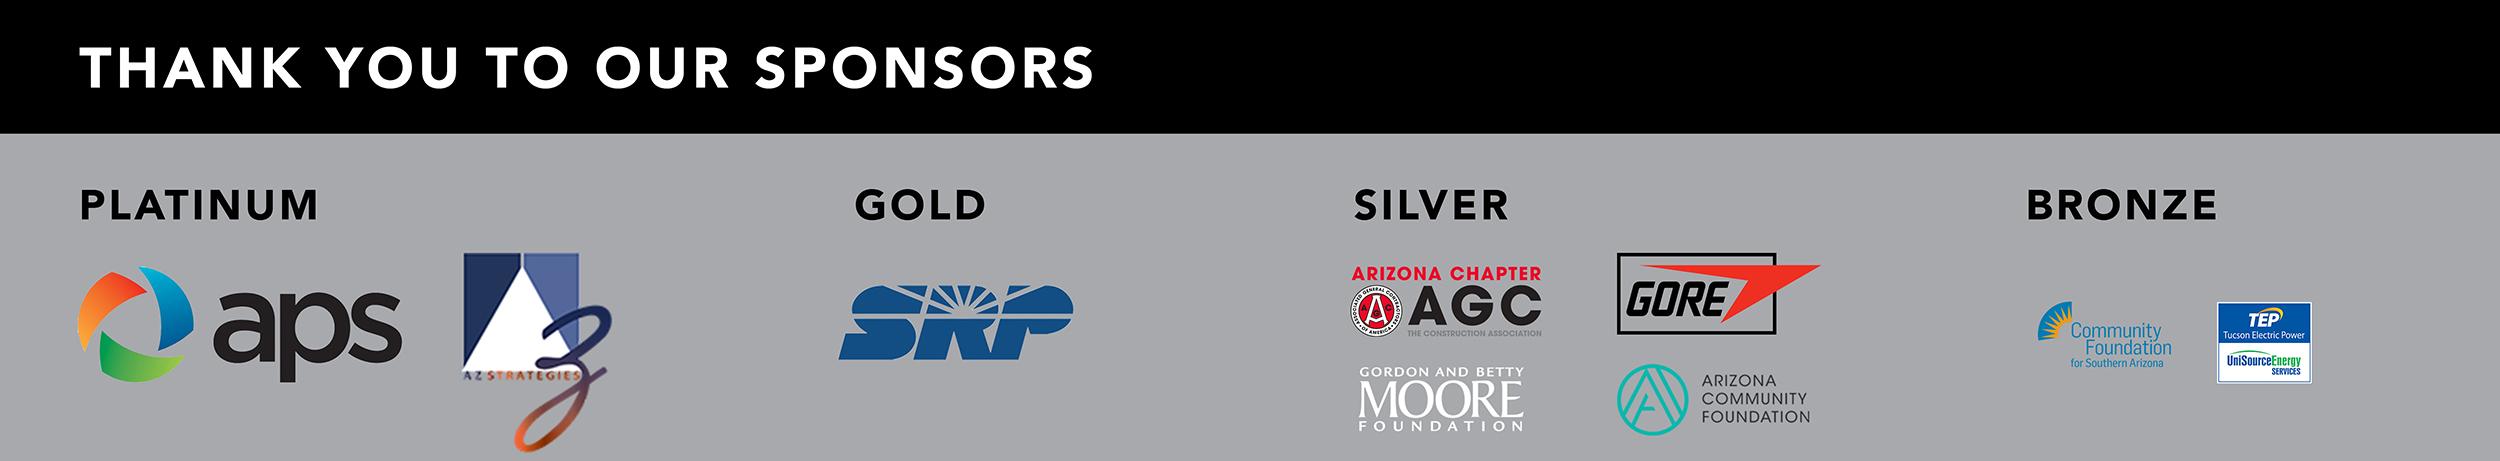 2021 Regents' Cup sponsors